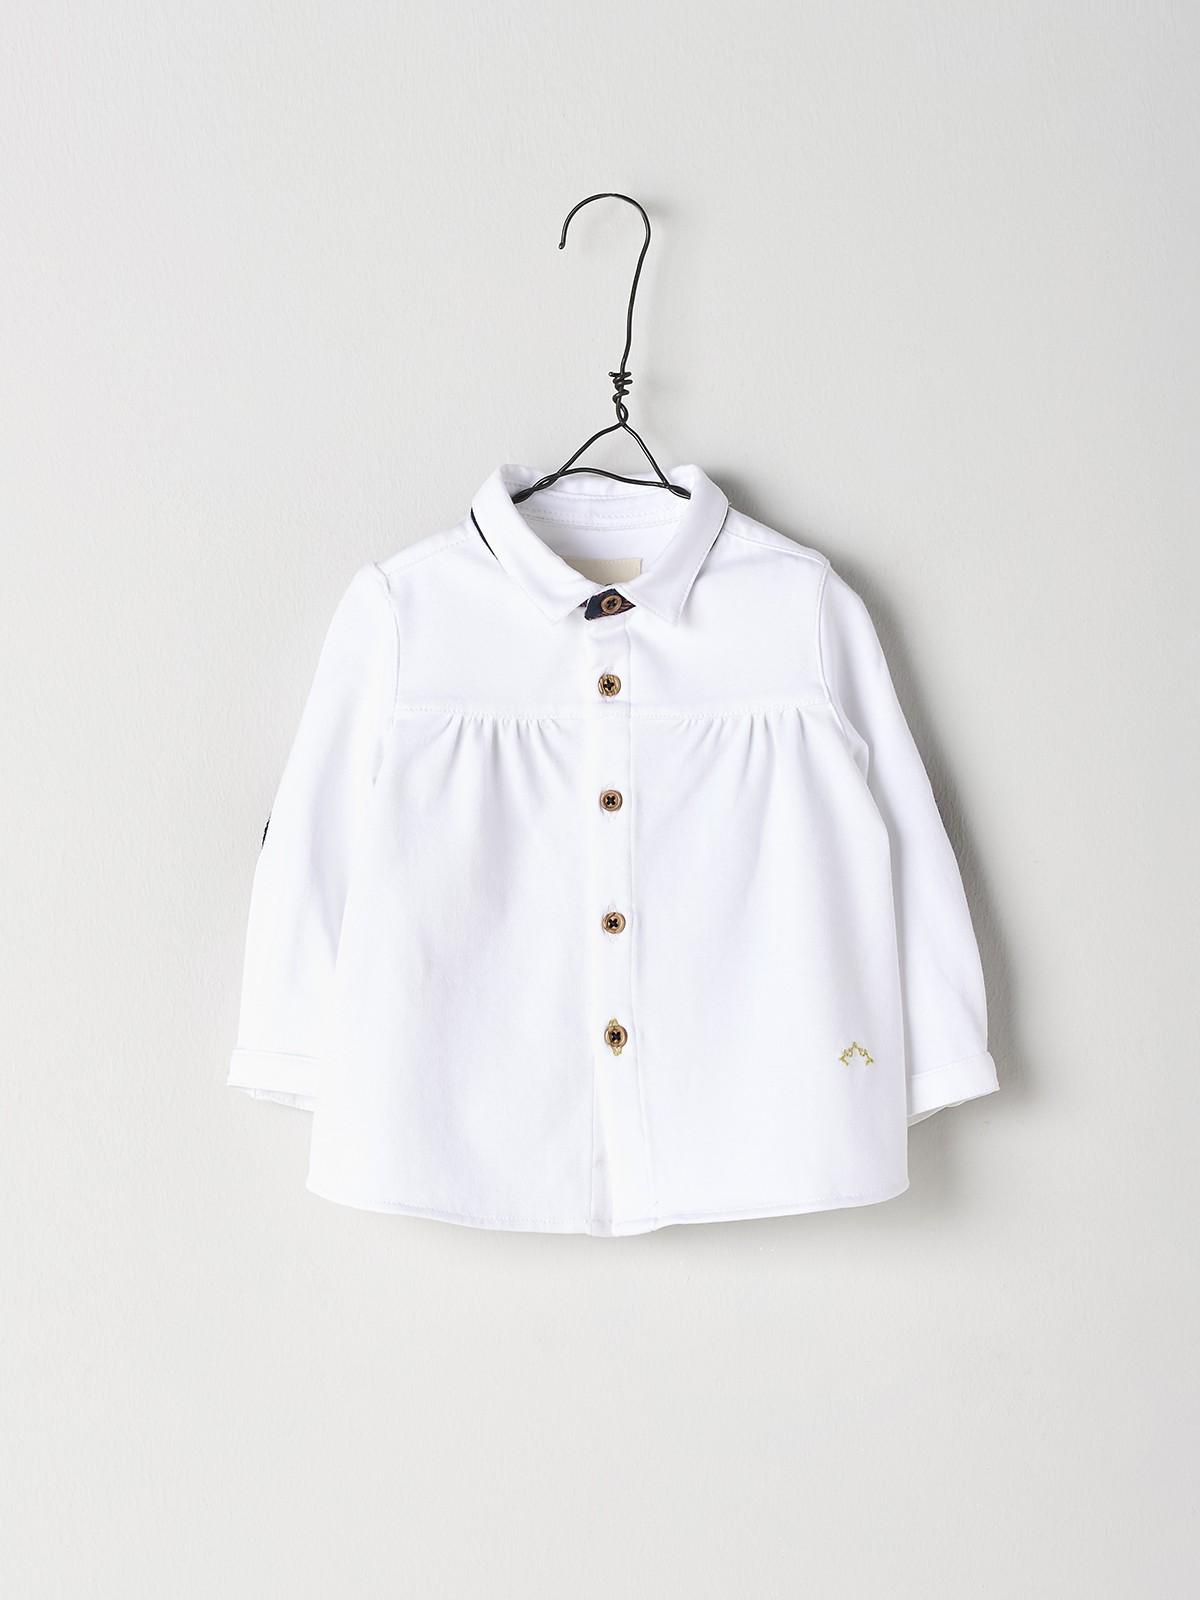 NANOS 白色棉質襯衫